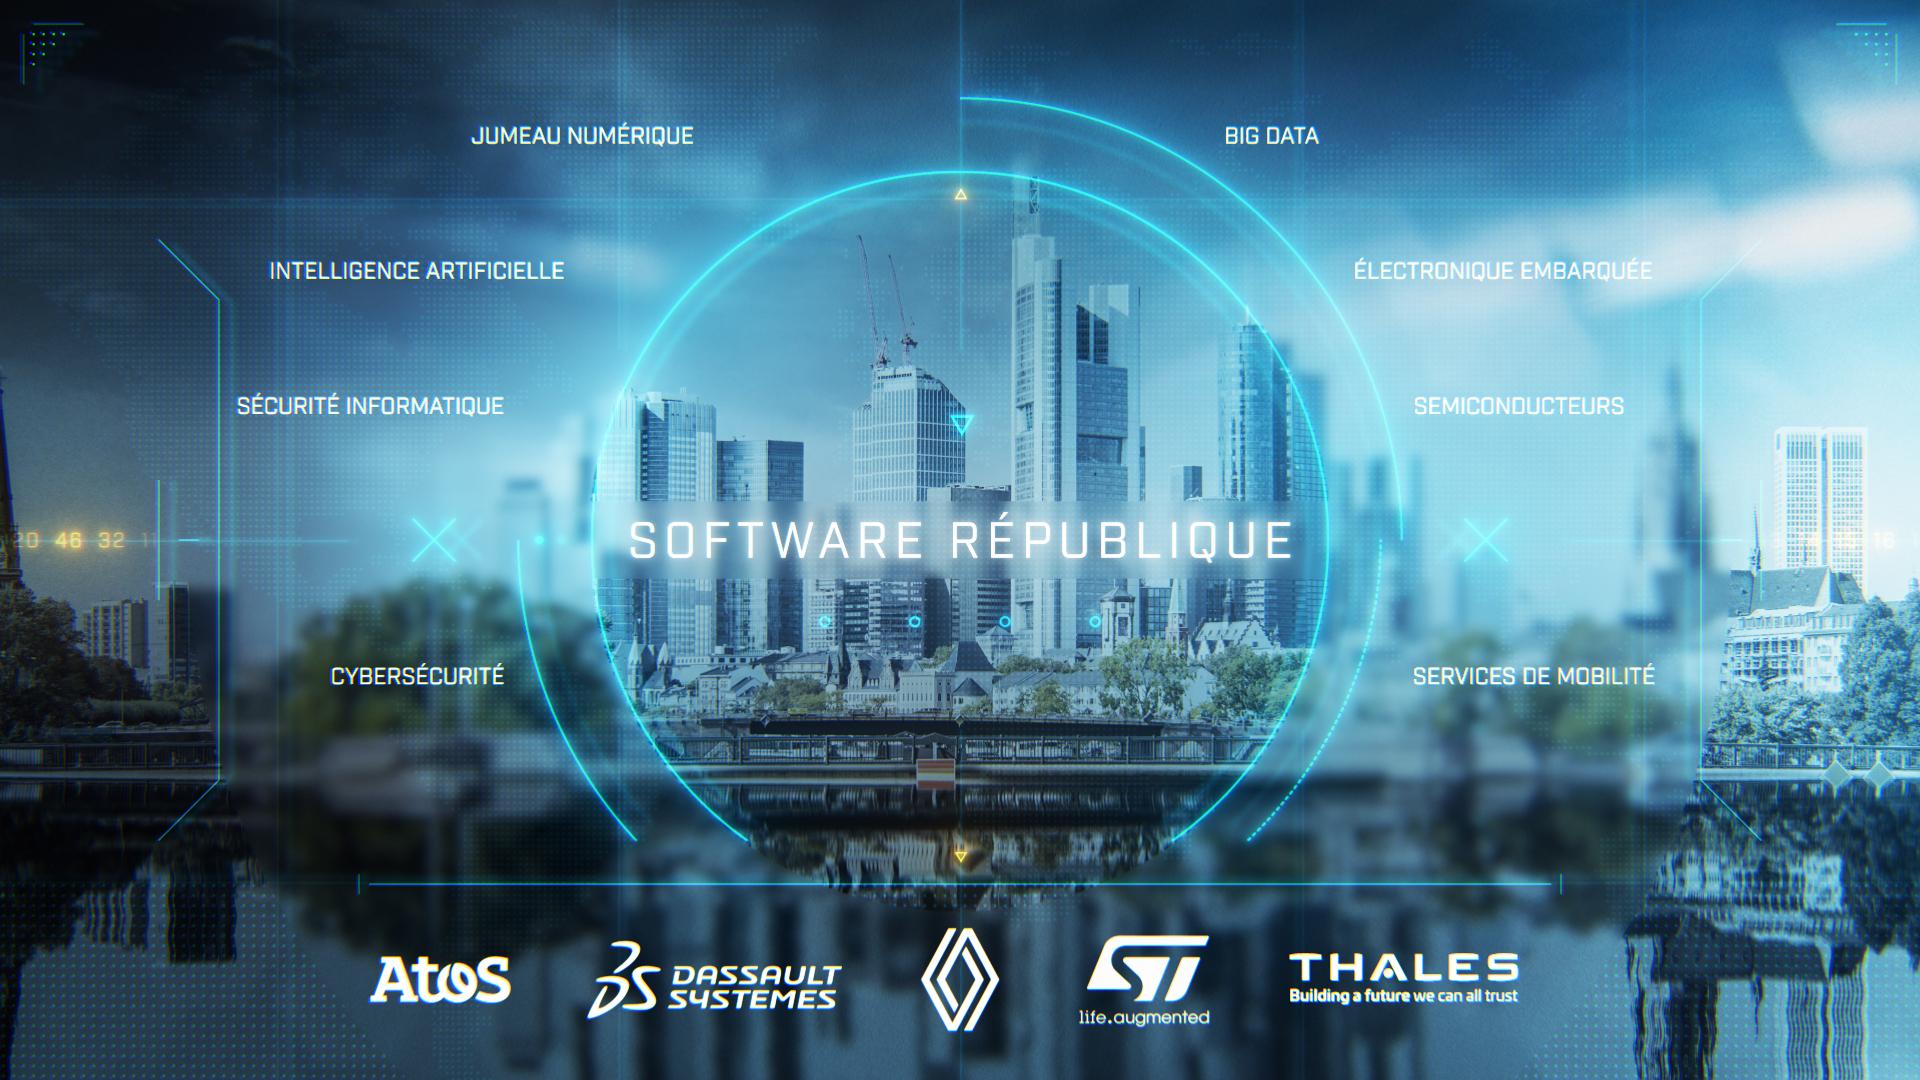 software republique